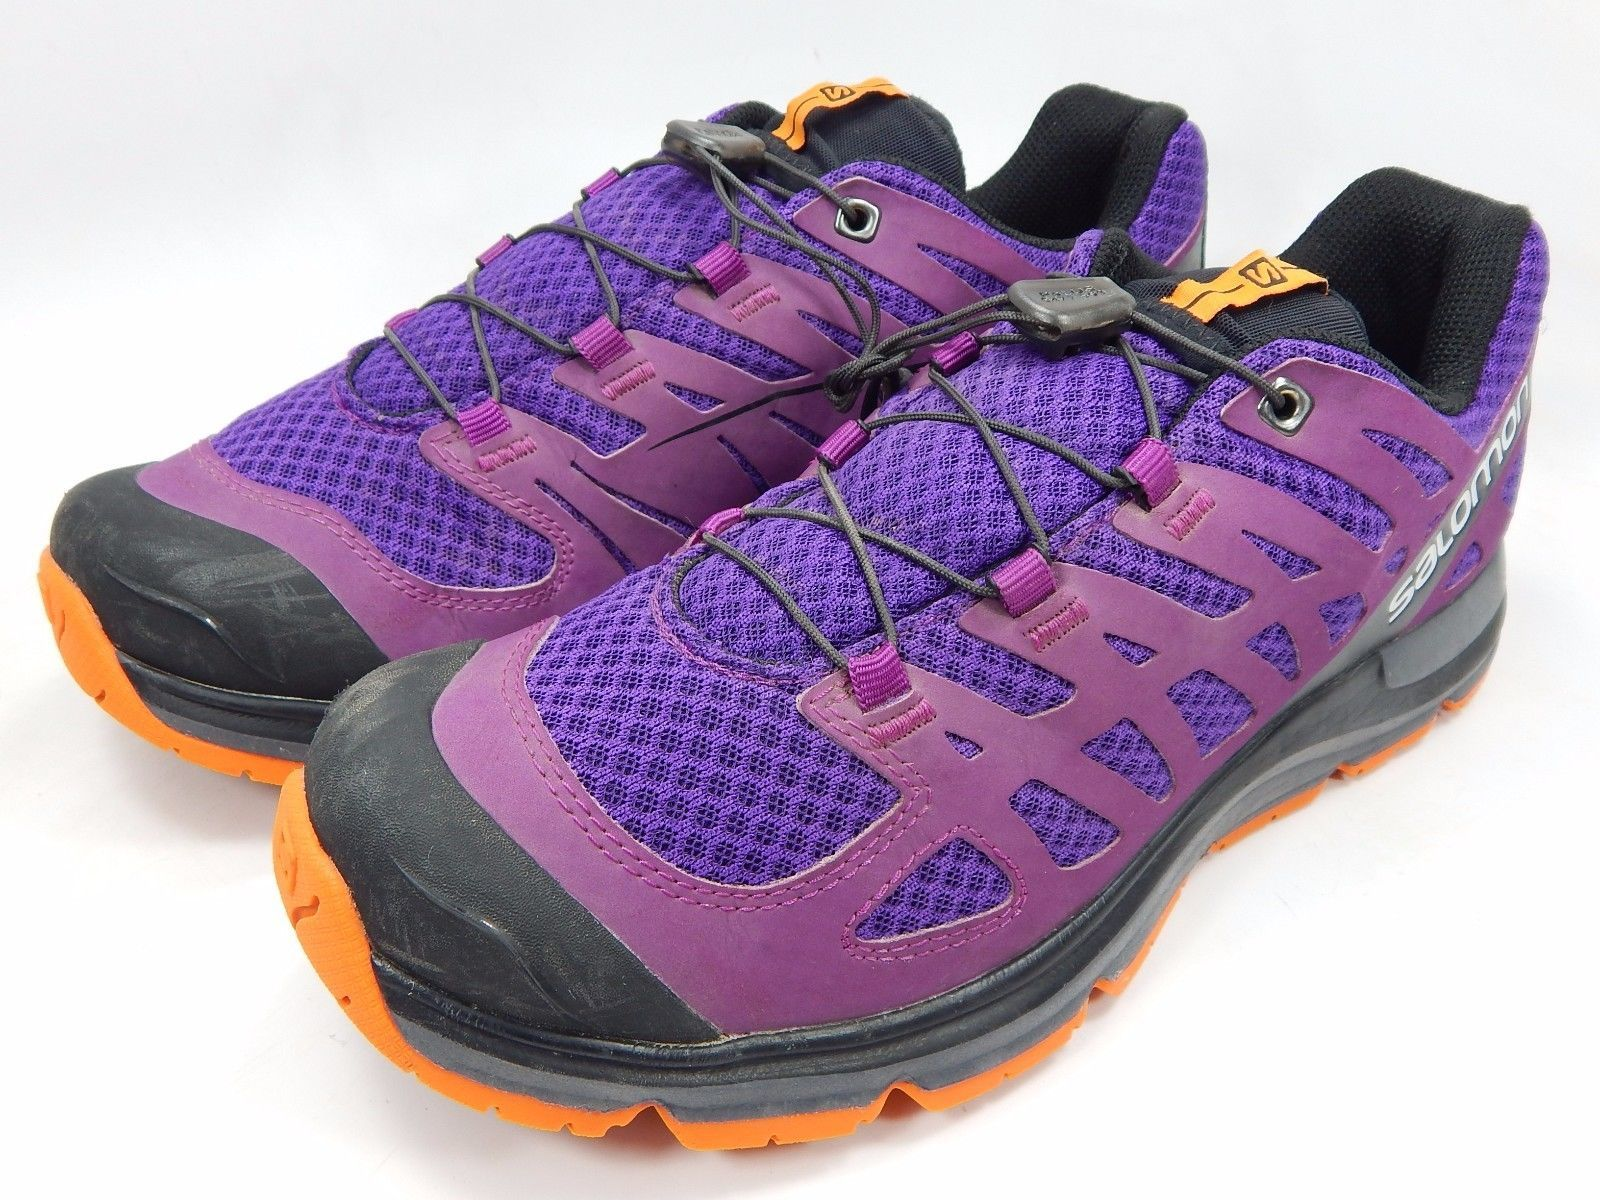 Salomon Synapse Women's Running Trail Shoes Size US 9.5 M (B) EU 42 Purple